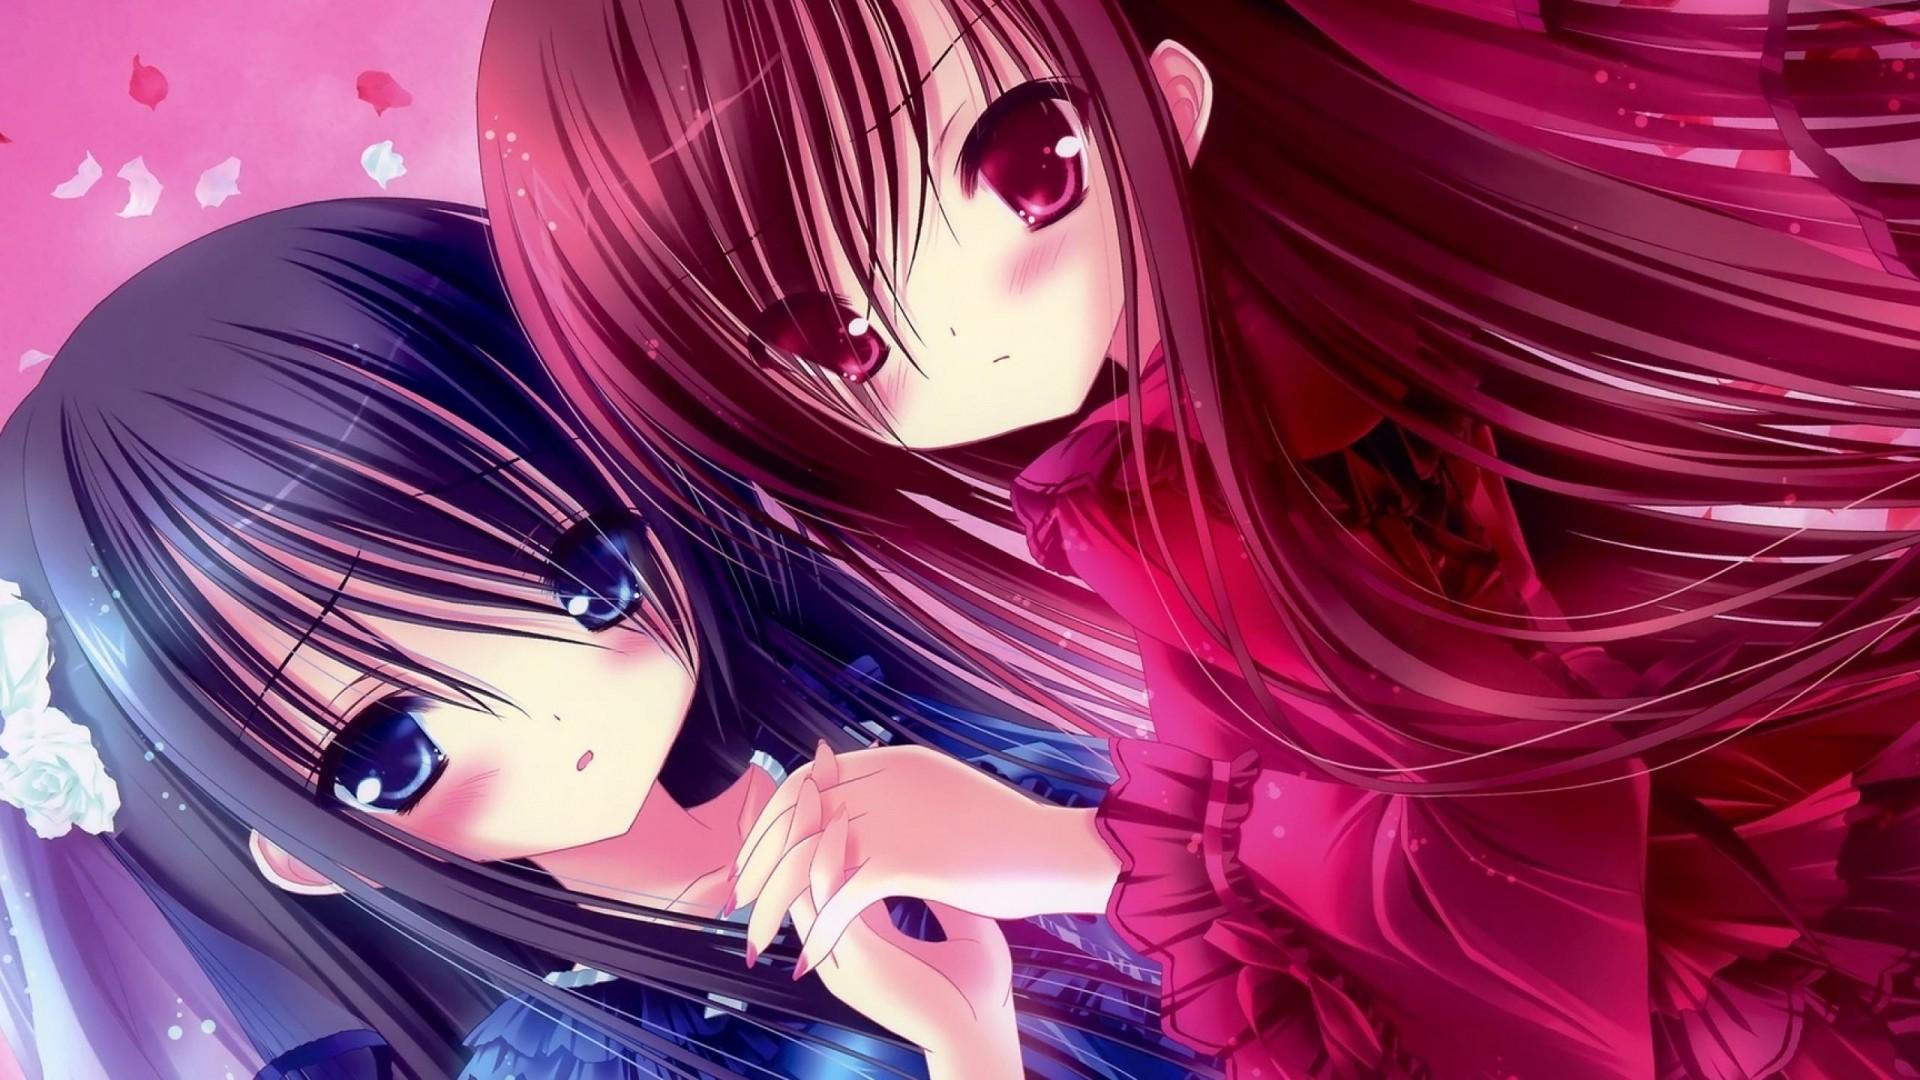 Wallpaper kawaii, anime, girl, friend, person